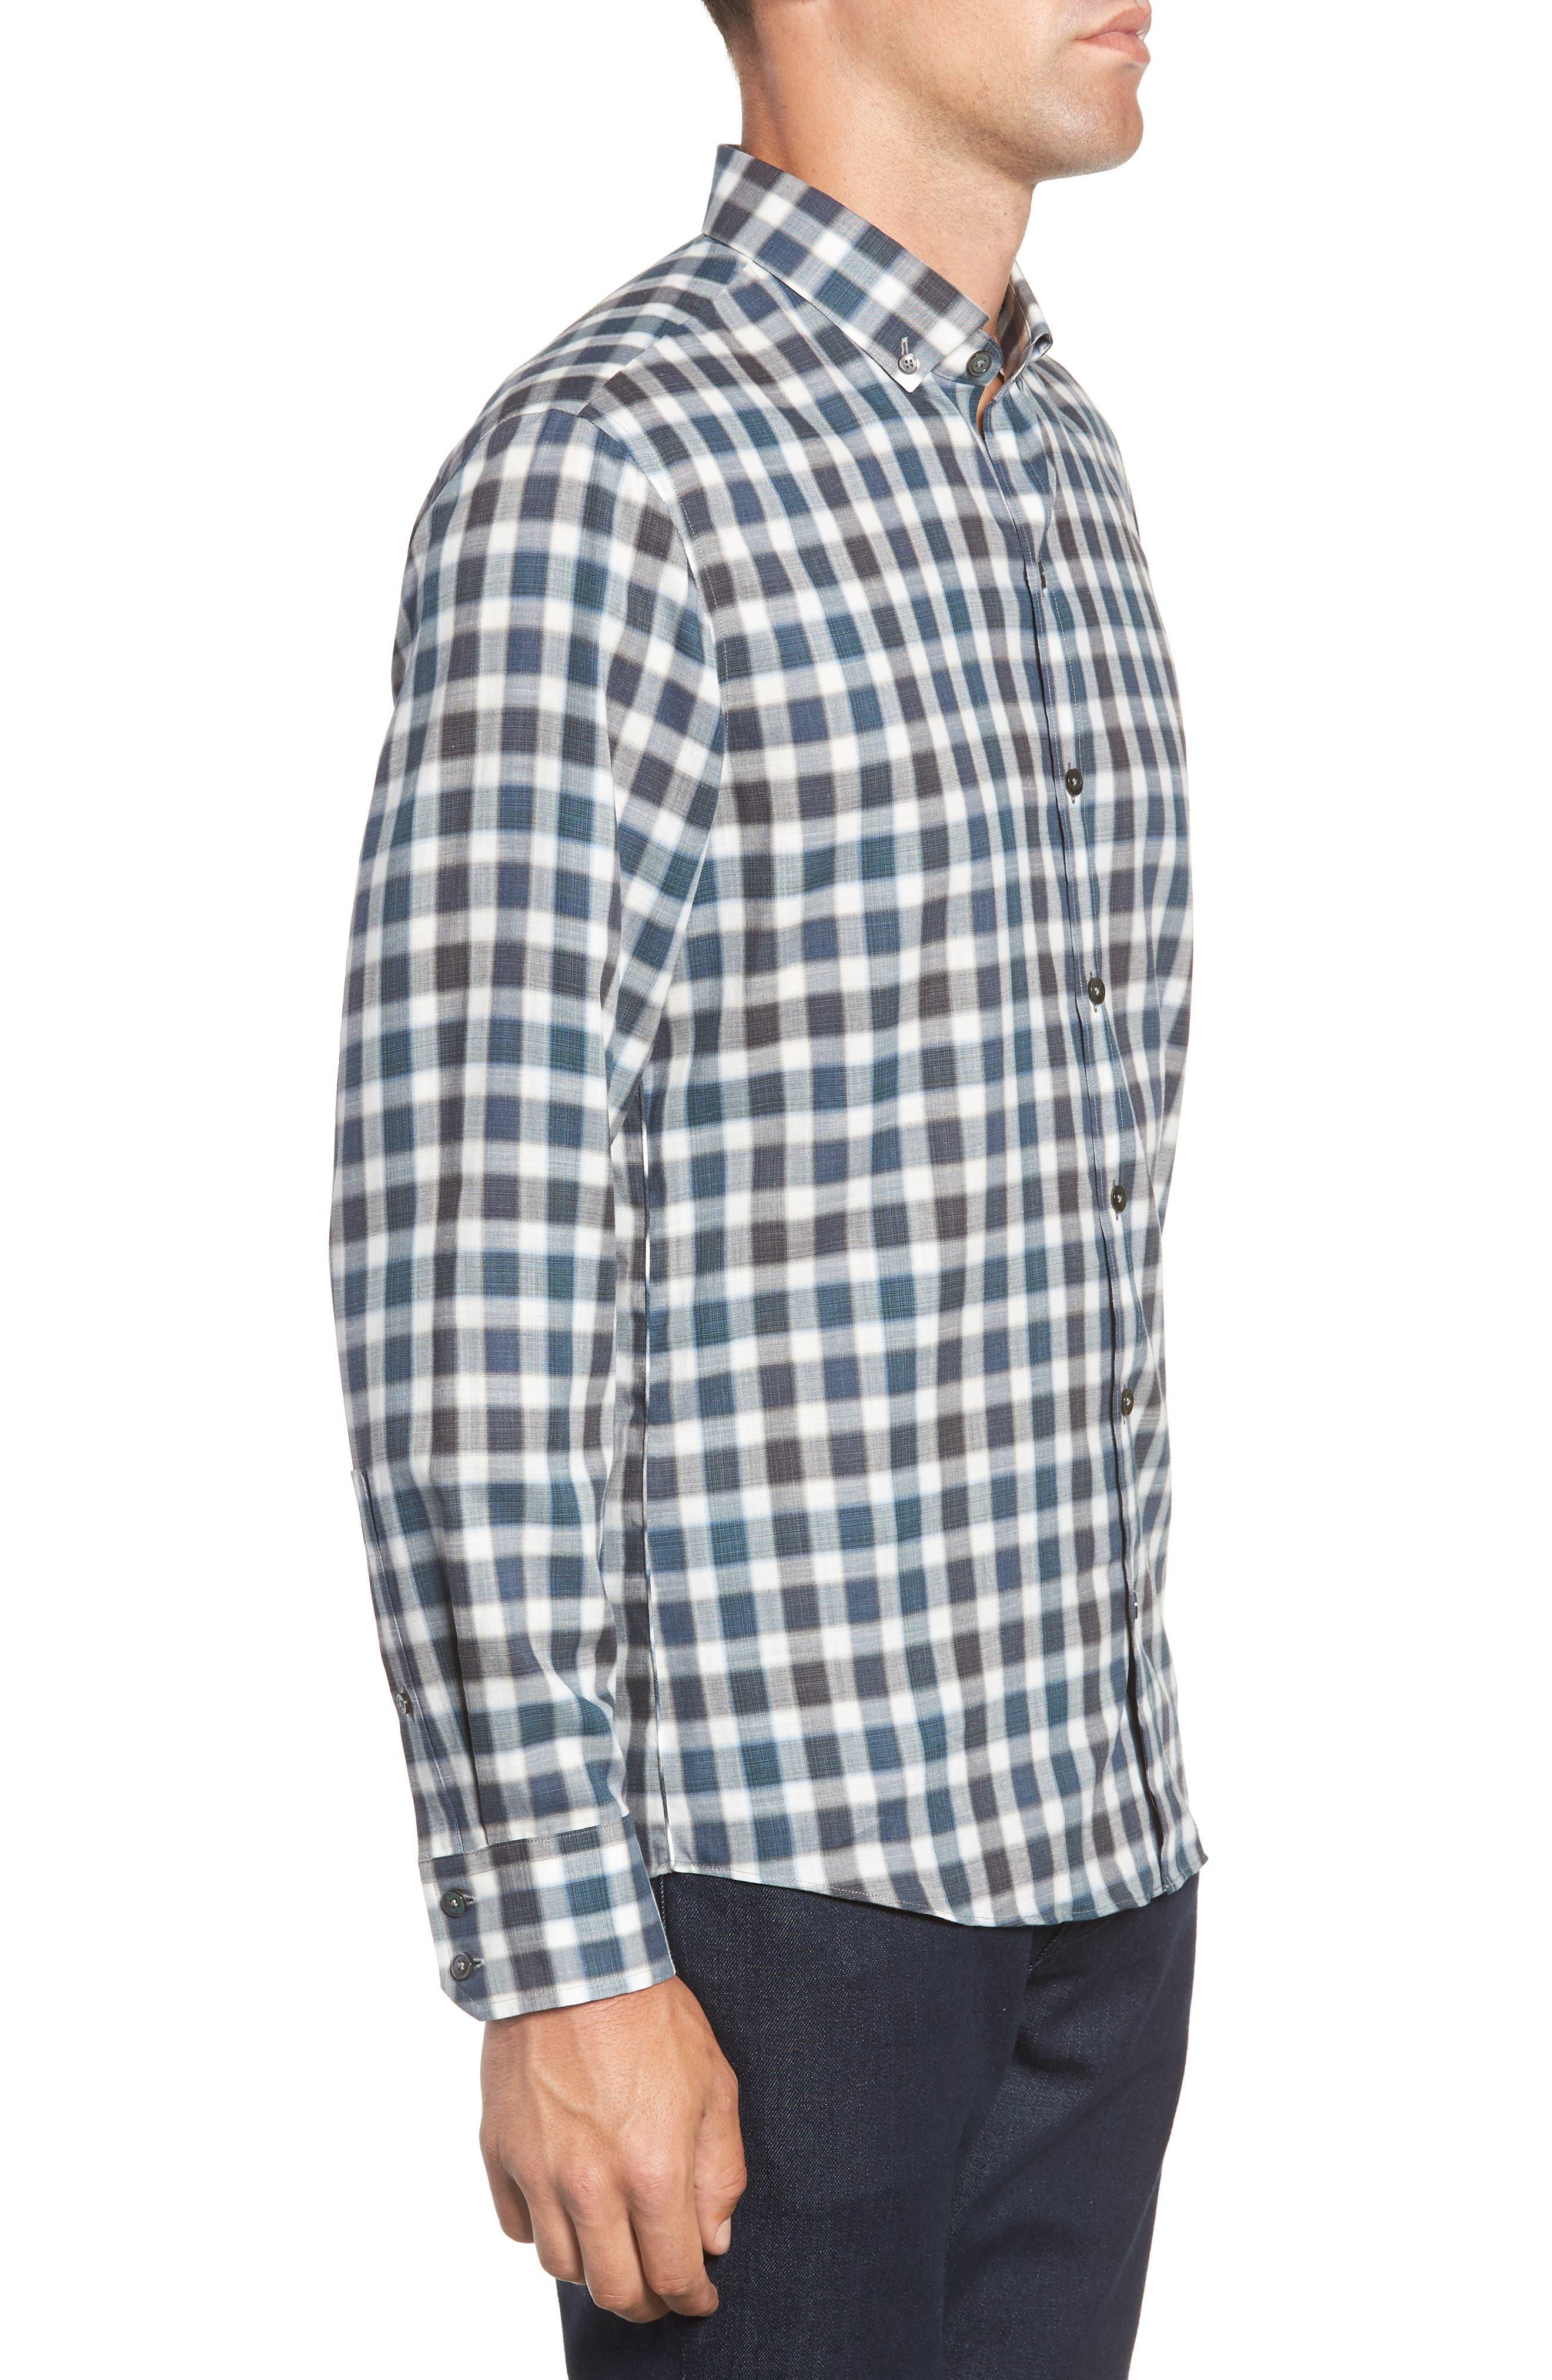 ZACHARY PRELL, Buffa Regular Fit Plaid Flannel Sport Shirt, Alternate thumbnail 4, color, DARK TEAL